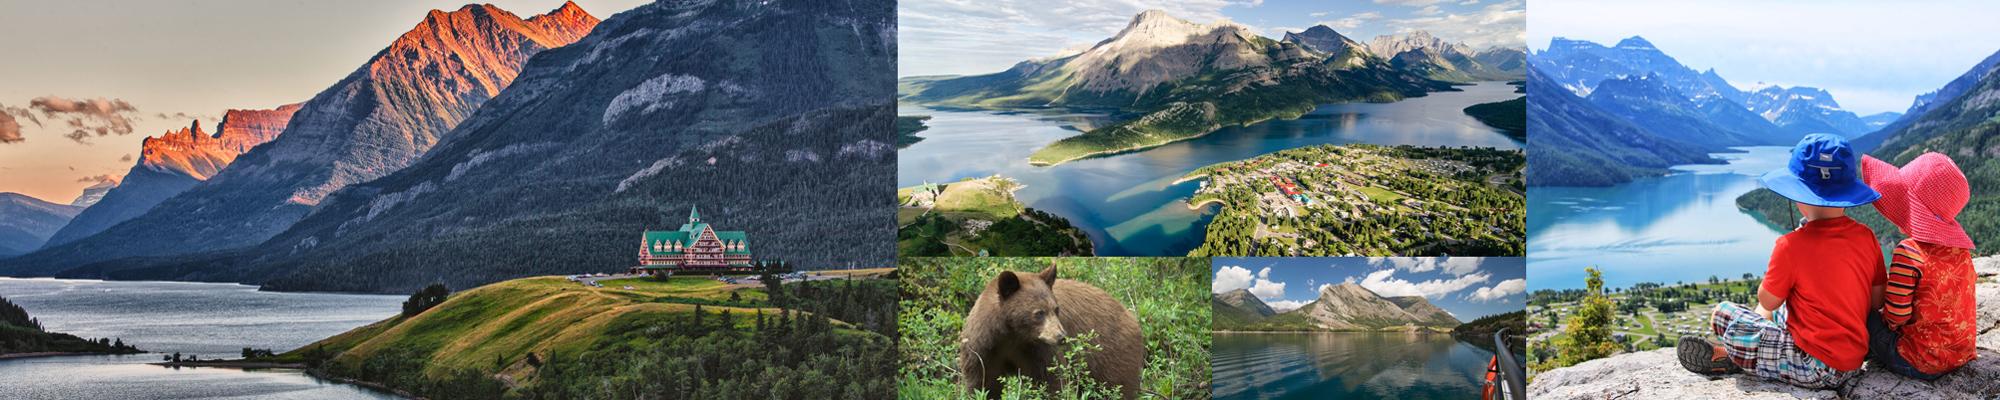 parco nazionale di Waterton Lakes Canada